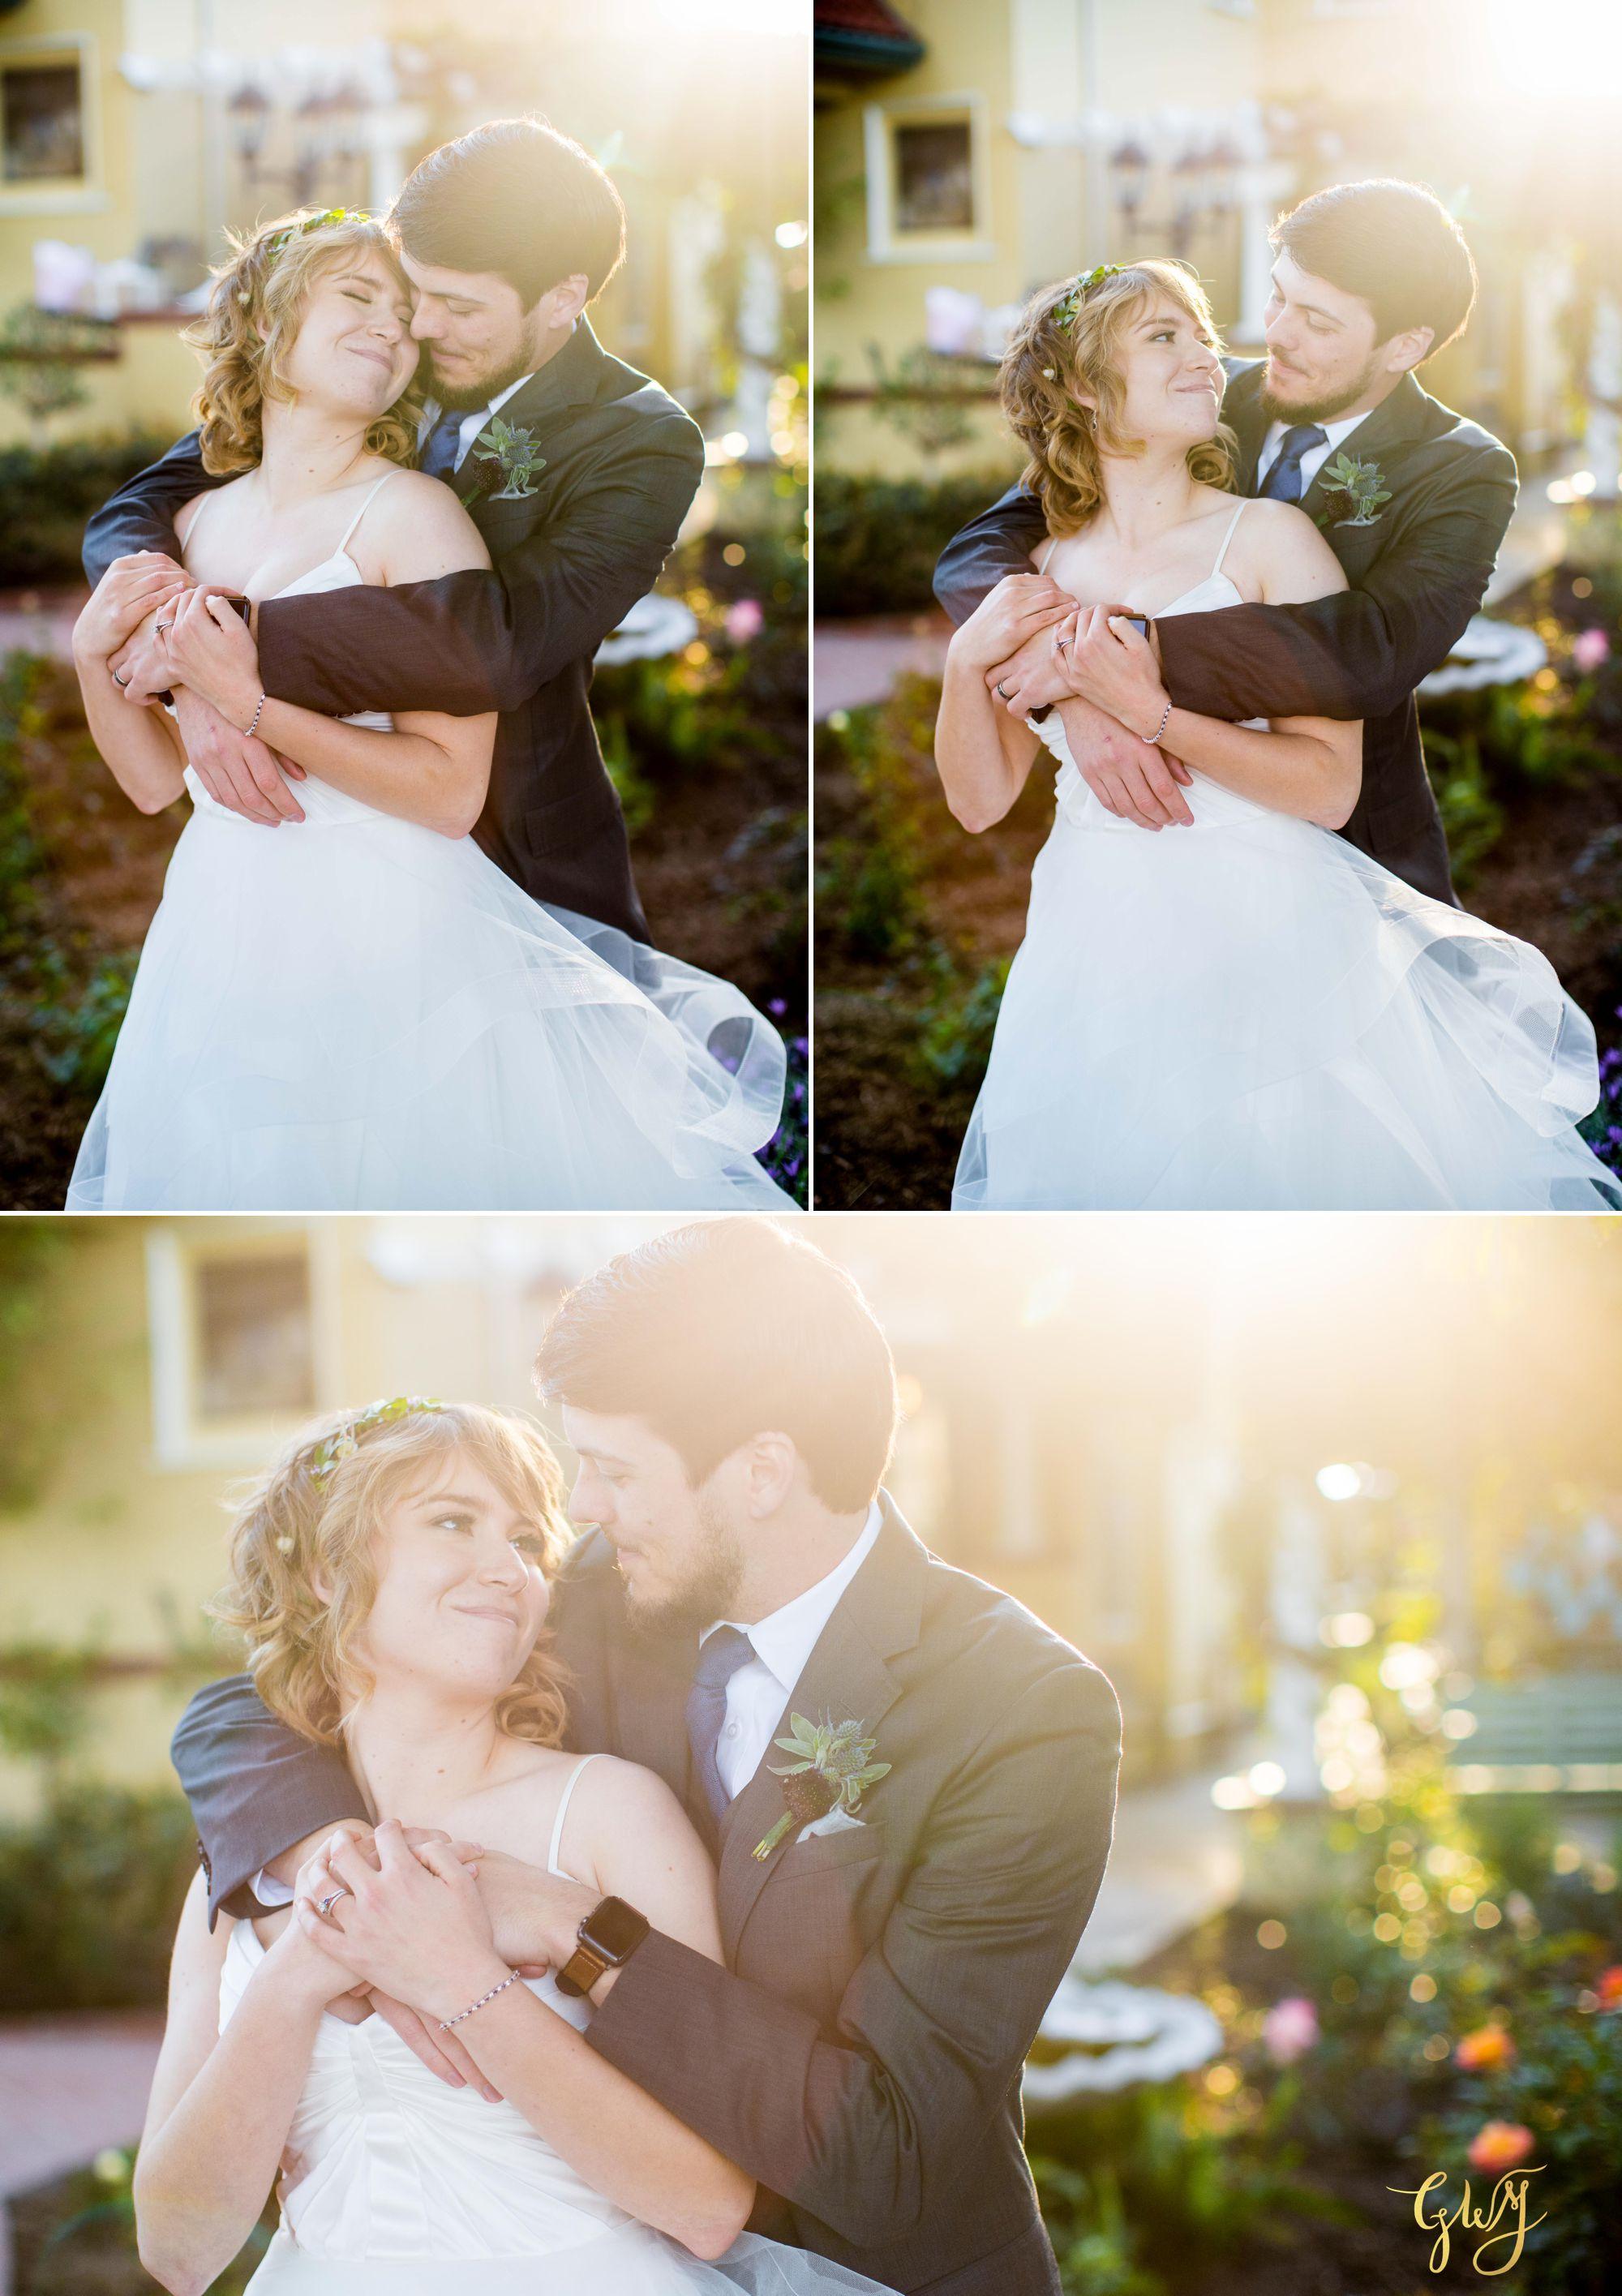 Garrett + Michelle's French Estate Orange County Spring Wedding by Glass Woods Media 36.jpg